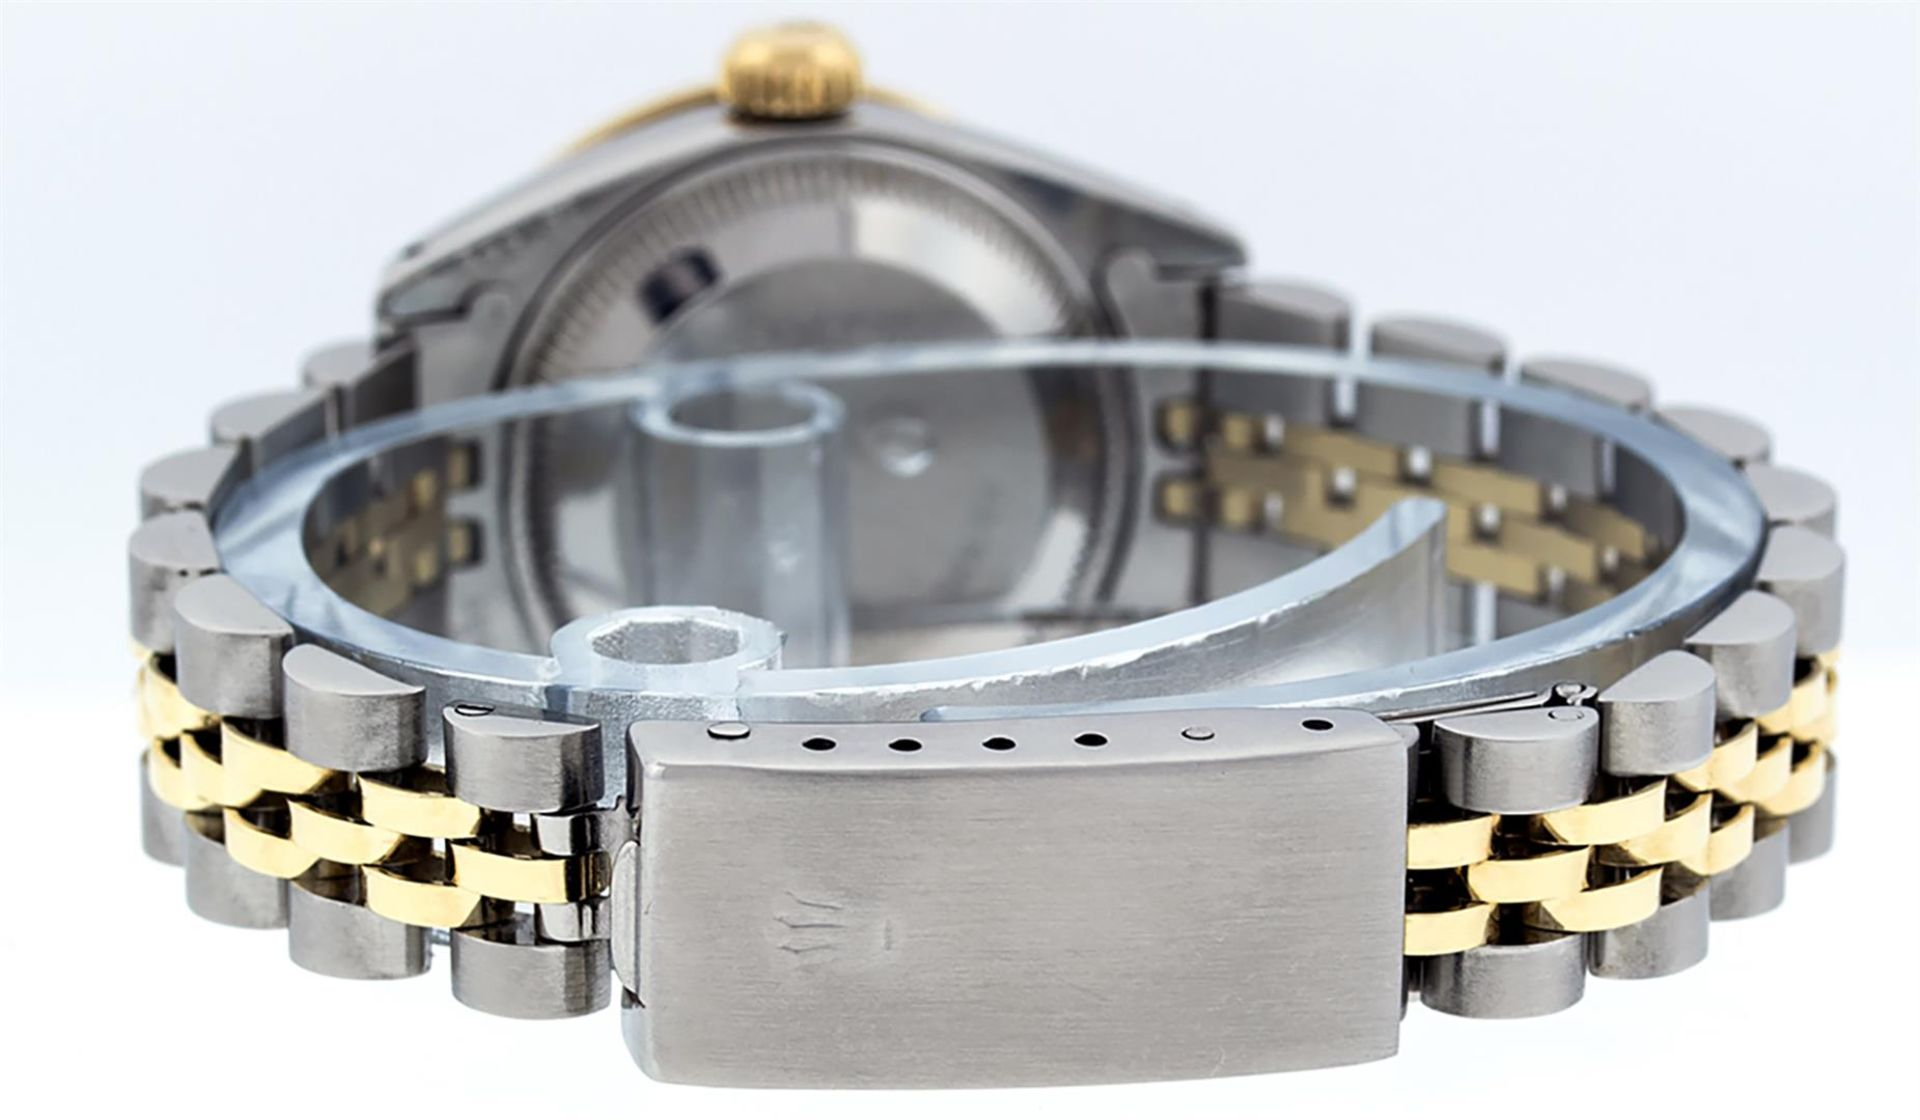 Rolex Ladies 2 Tone Black Lugs & Pyramid Diamond Datejust Wriswatch - Image 5 of 7